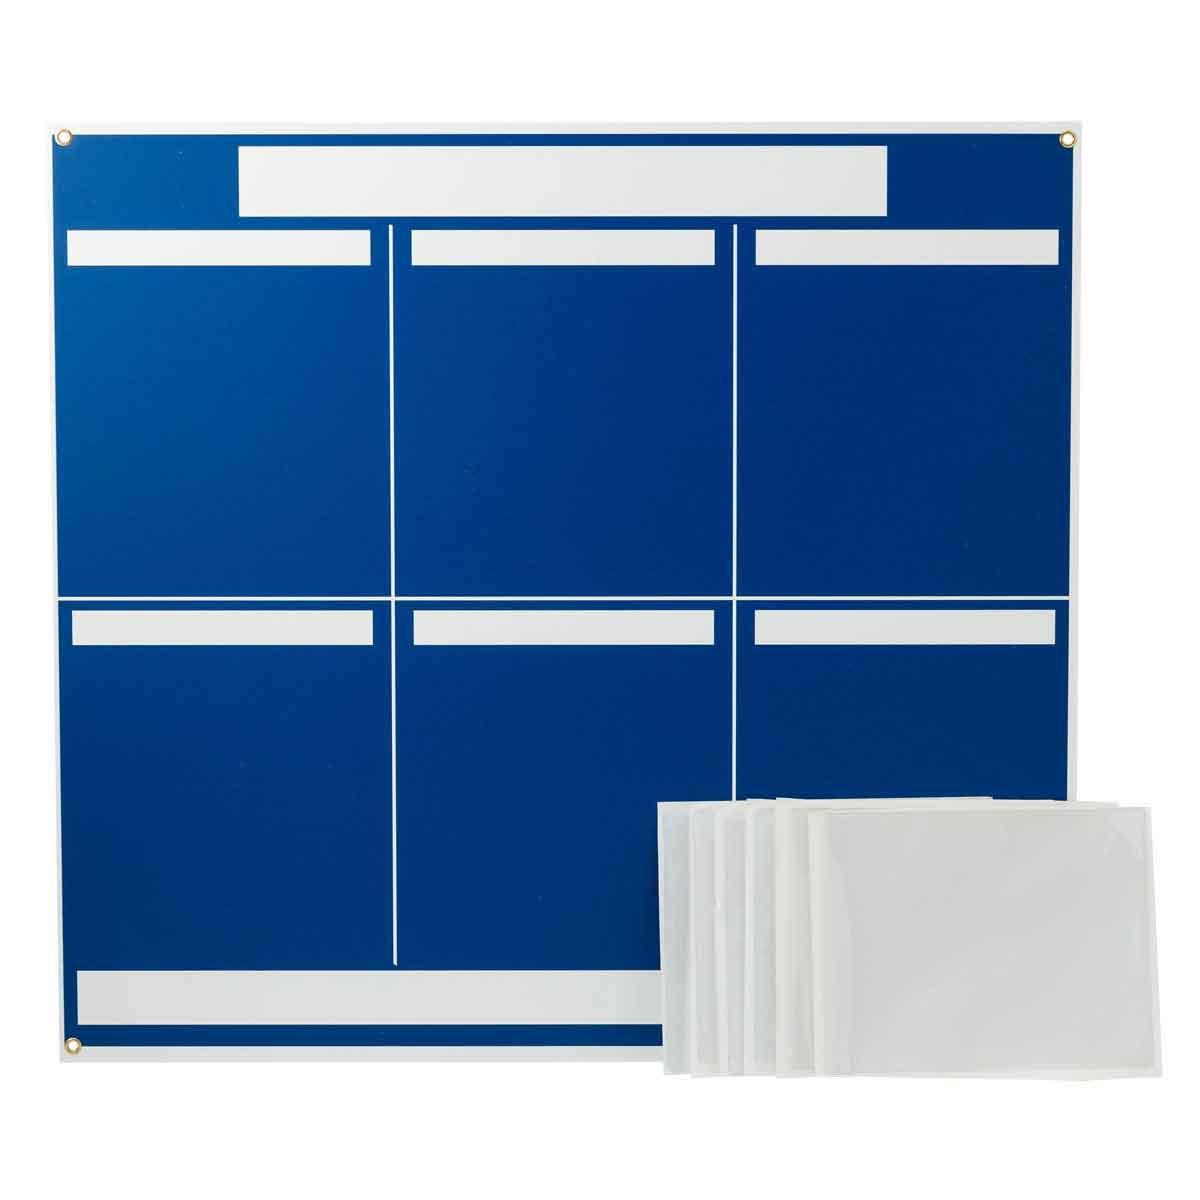 Brady® 114613 6-Panel Information Center Lean Communication Board, 34-1/4 in H, White on Blue, Rectangle Shape, Polystyrene